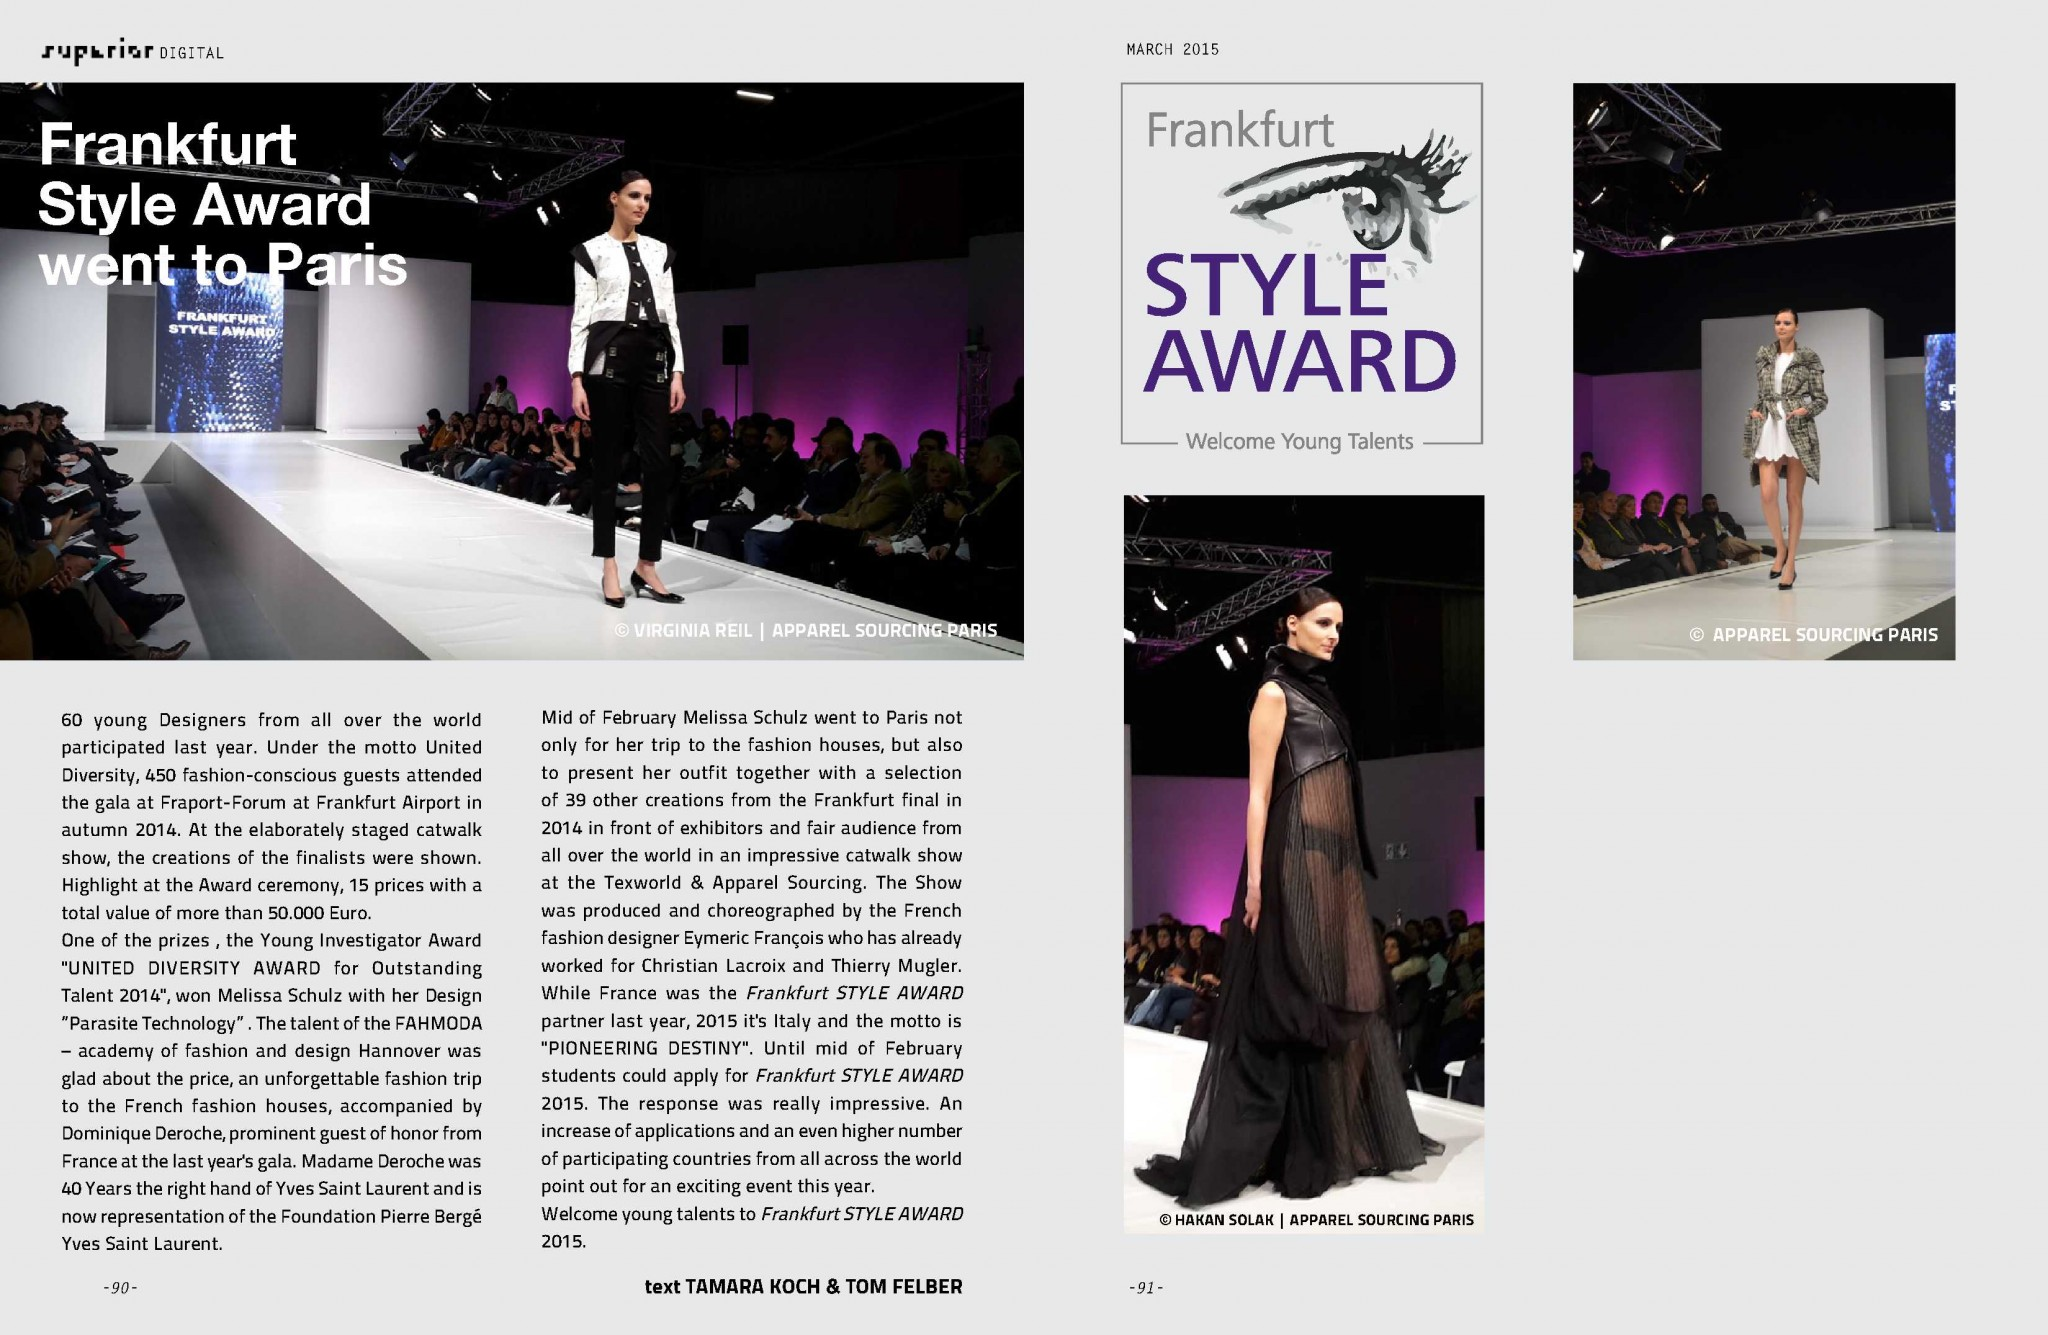 SUPERIOR DIGITAL March 2015 - Frankfurt Style Award_1